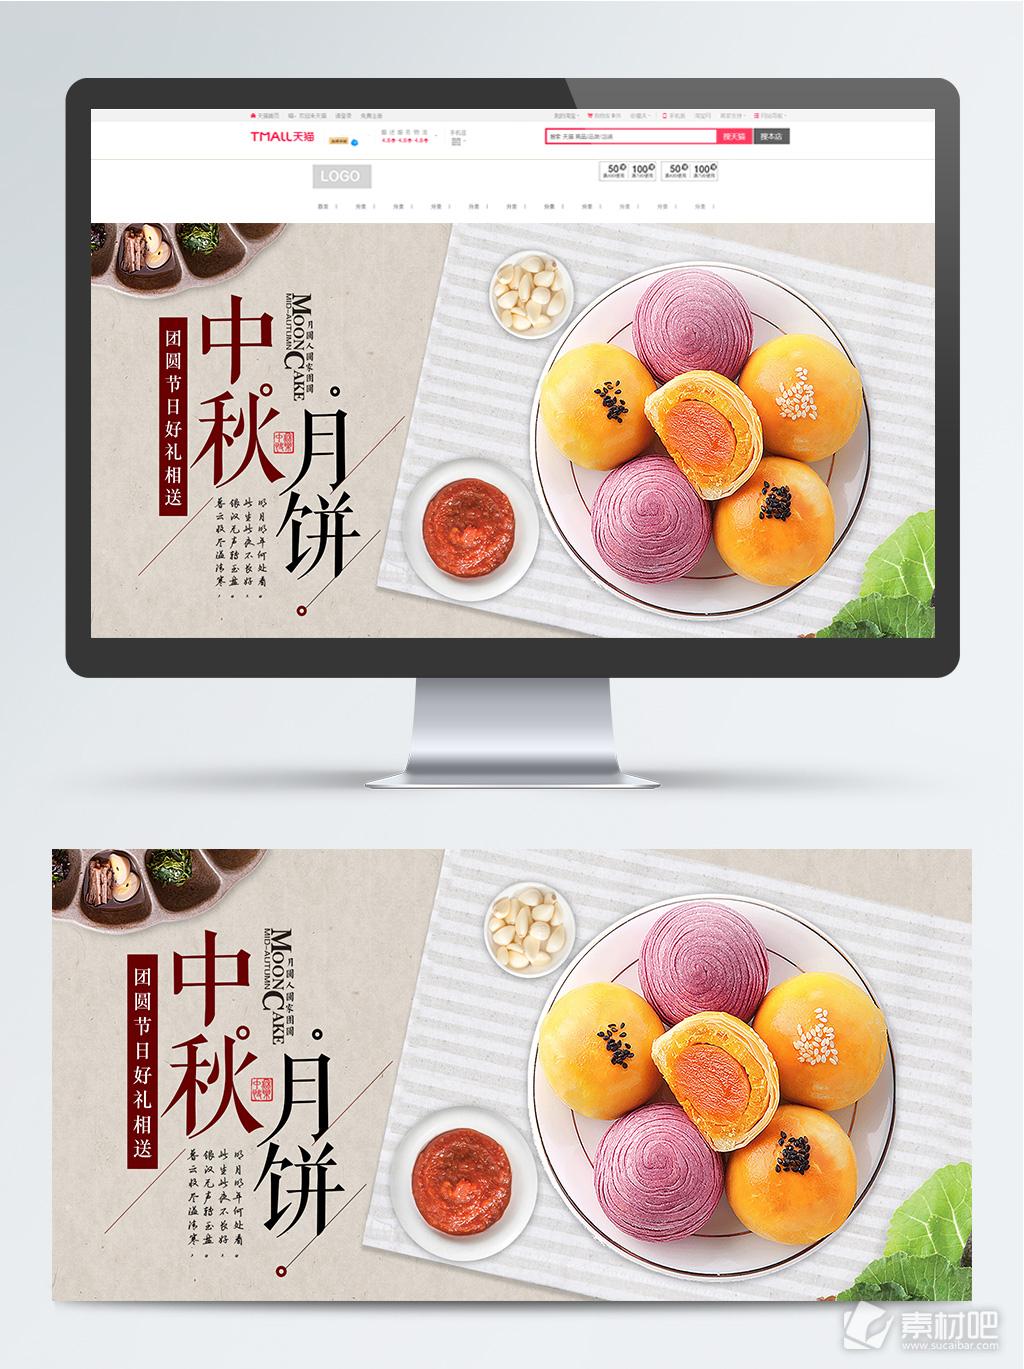 淘宝天猫中秋礼品食月饼banner